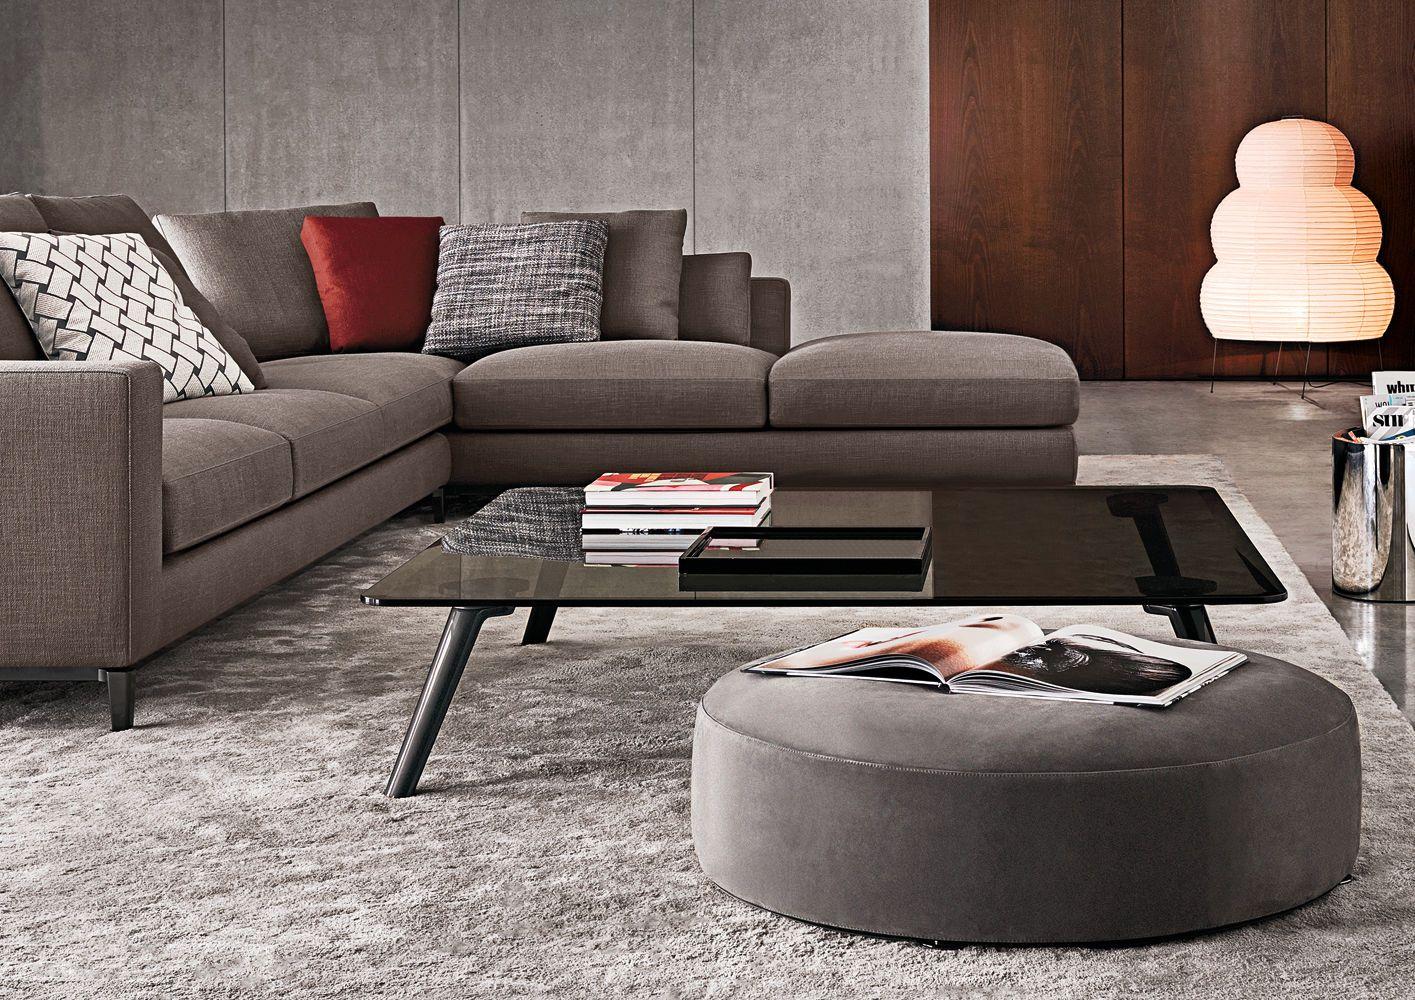 Coffee Table Triangular Round Oval Sullivan Minotti Coffee Table Contemporary Coffee Table Sofa Layout [ 1000 x 1415 Pixel ]